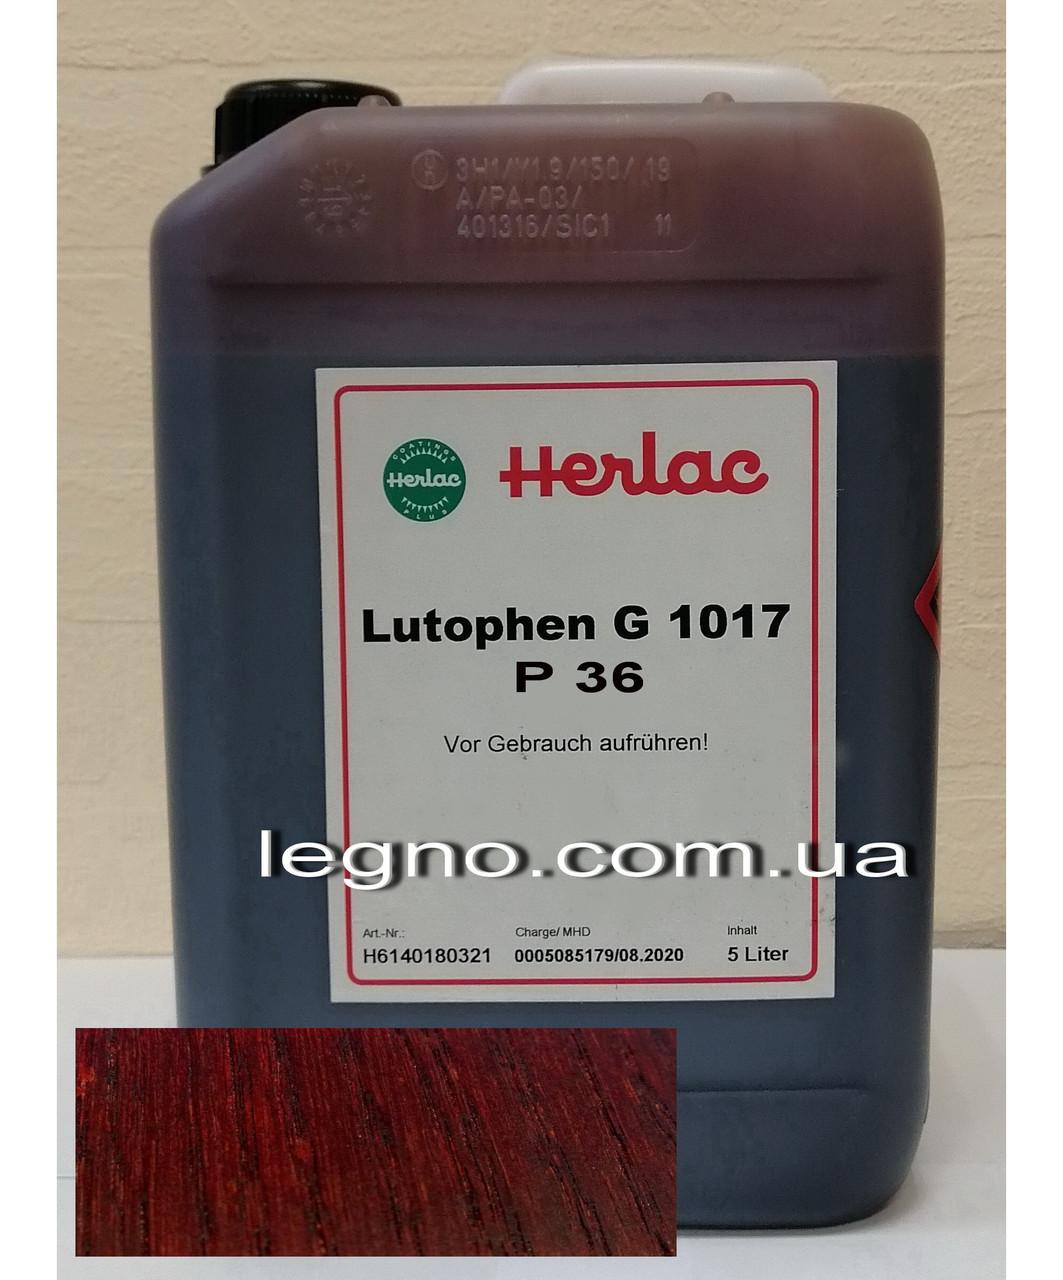 Нитрокраситель (нитробейц, морилка, краситель для дерева) Лютофен Р36 Махагон 5 л Herlac, Германия